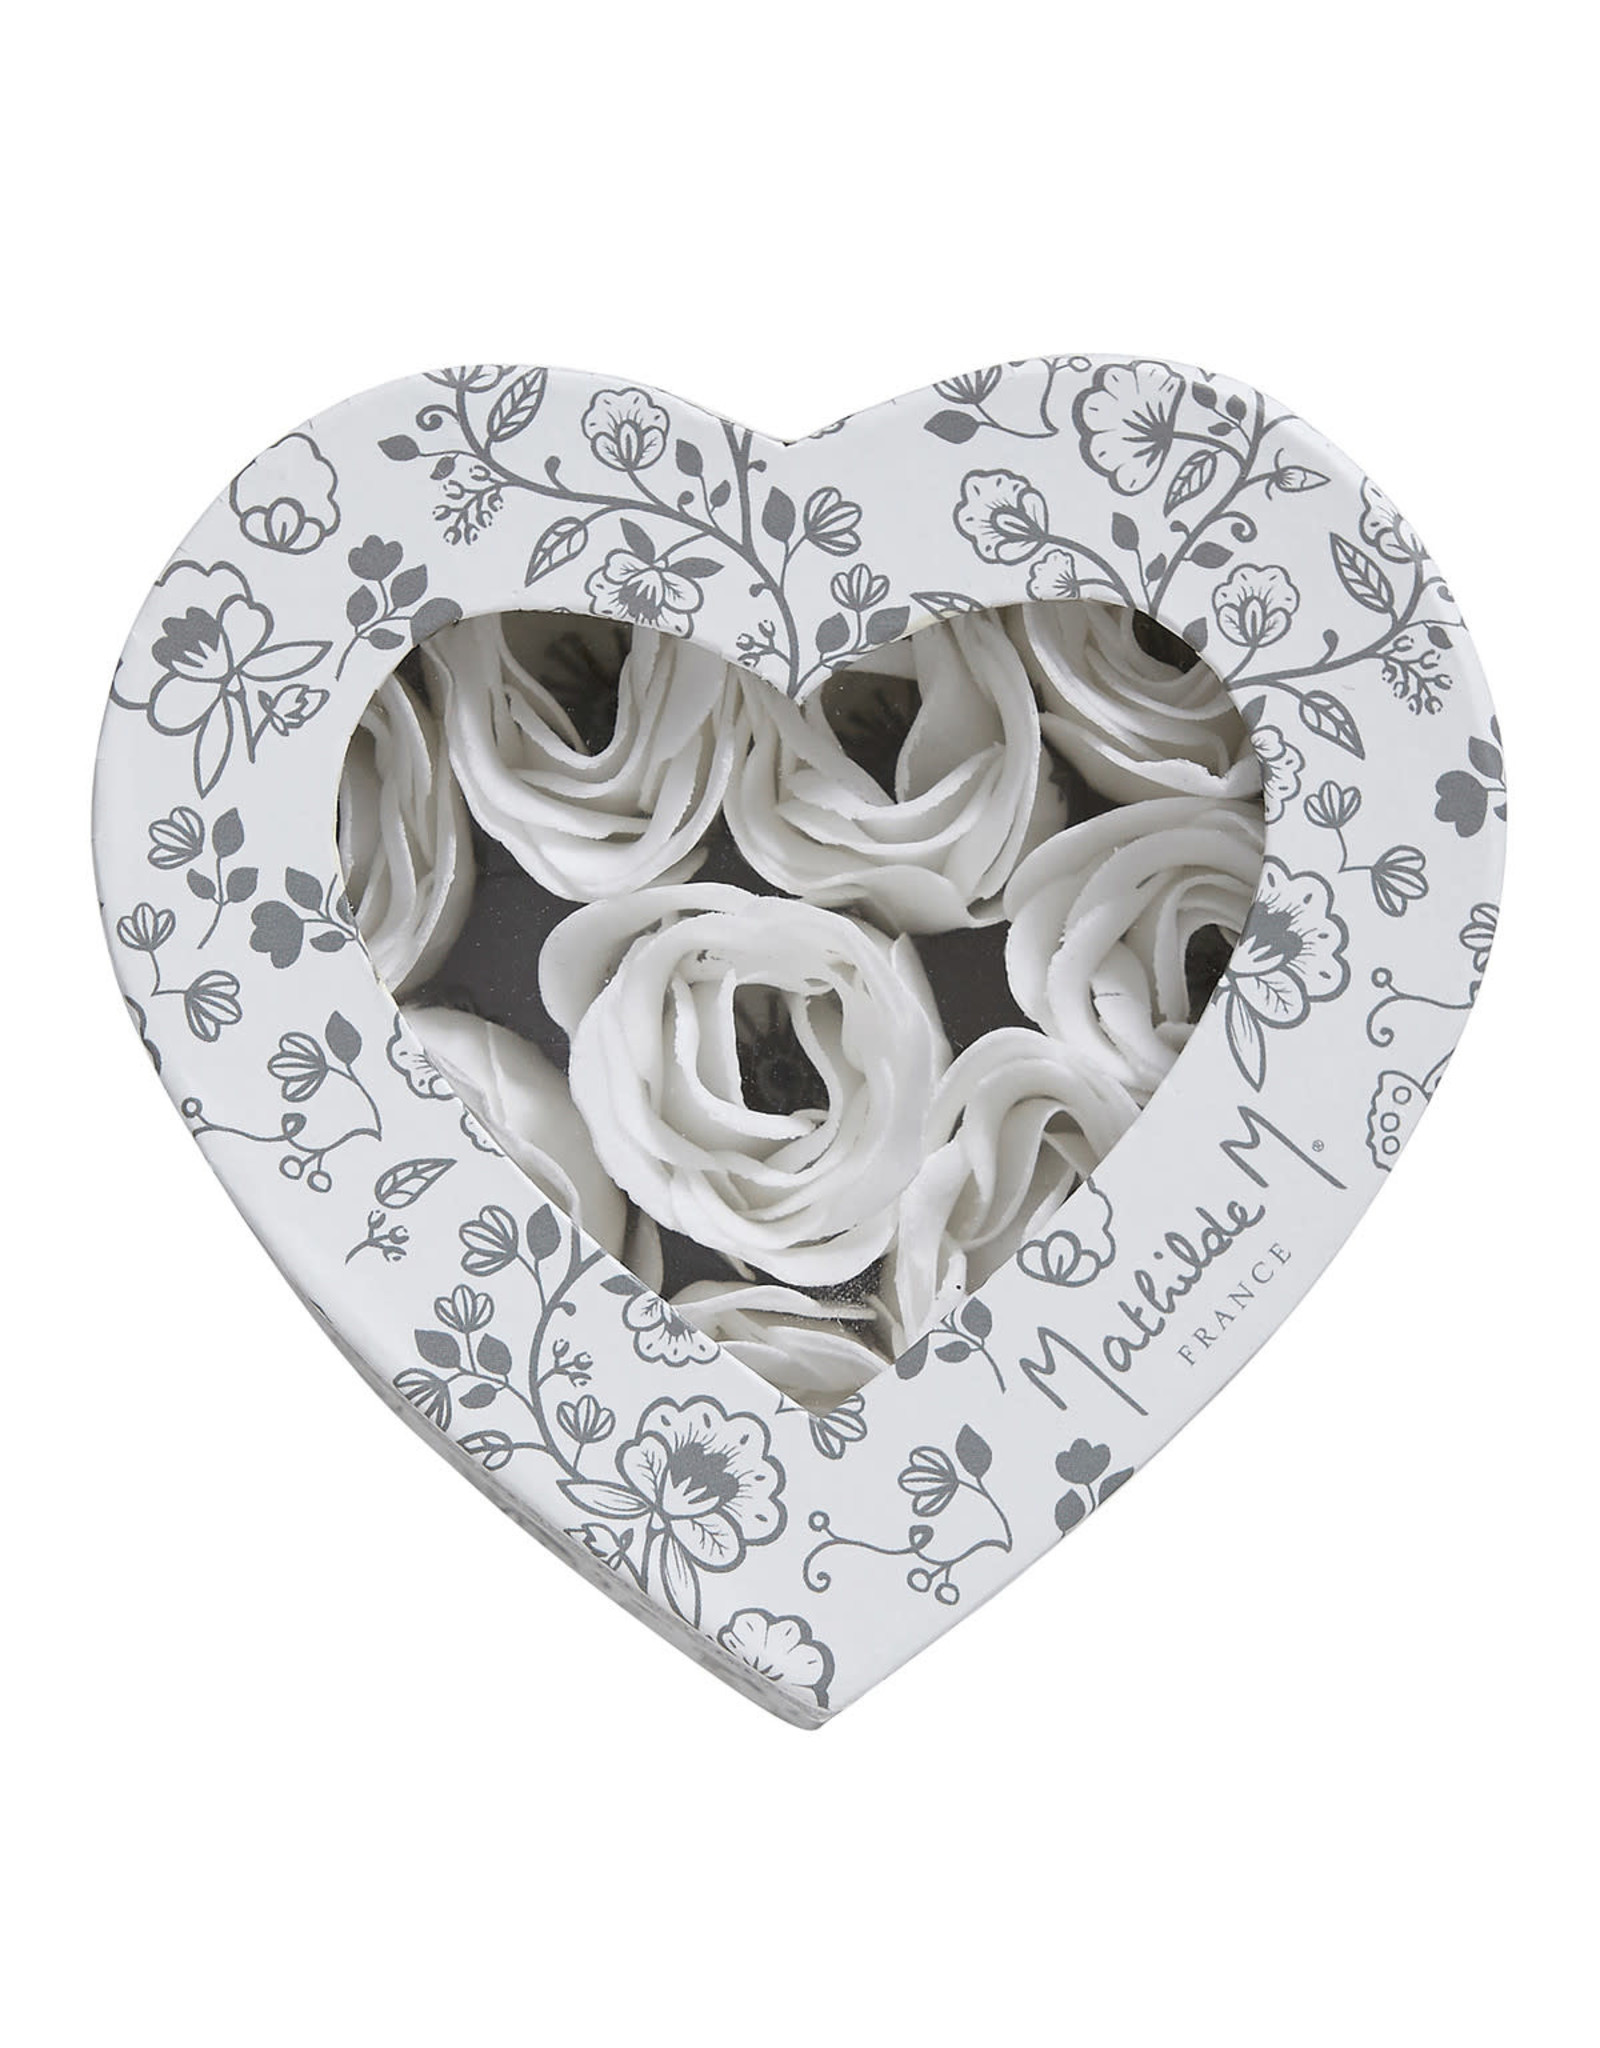 Mathilde M Rose - Zeepbloemen Giftbox